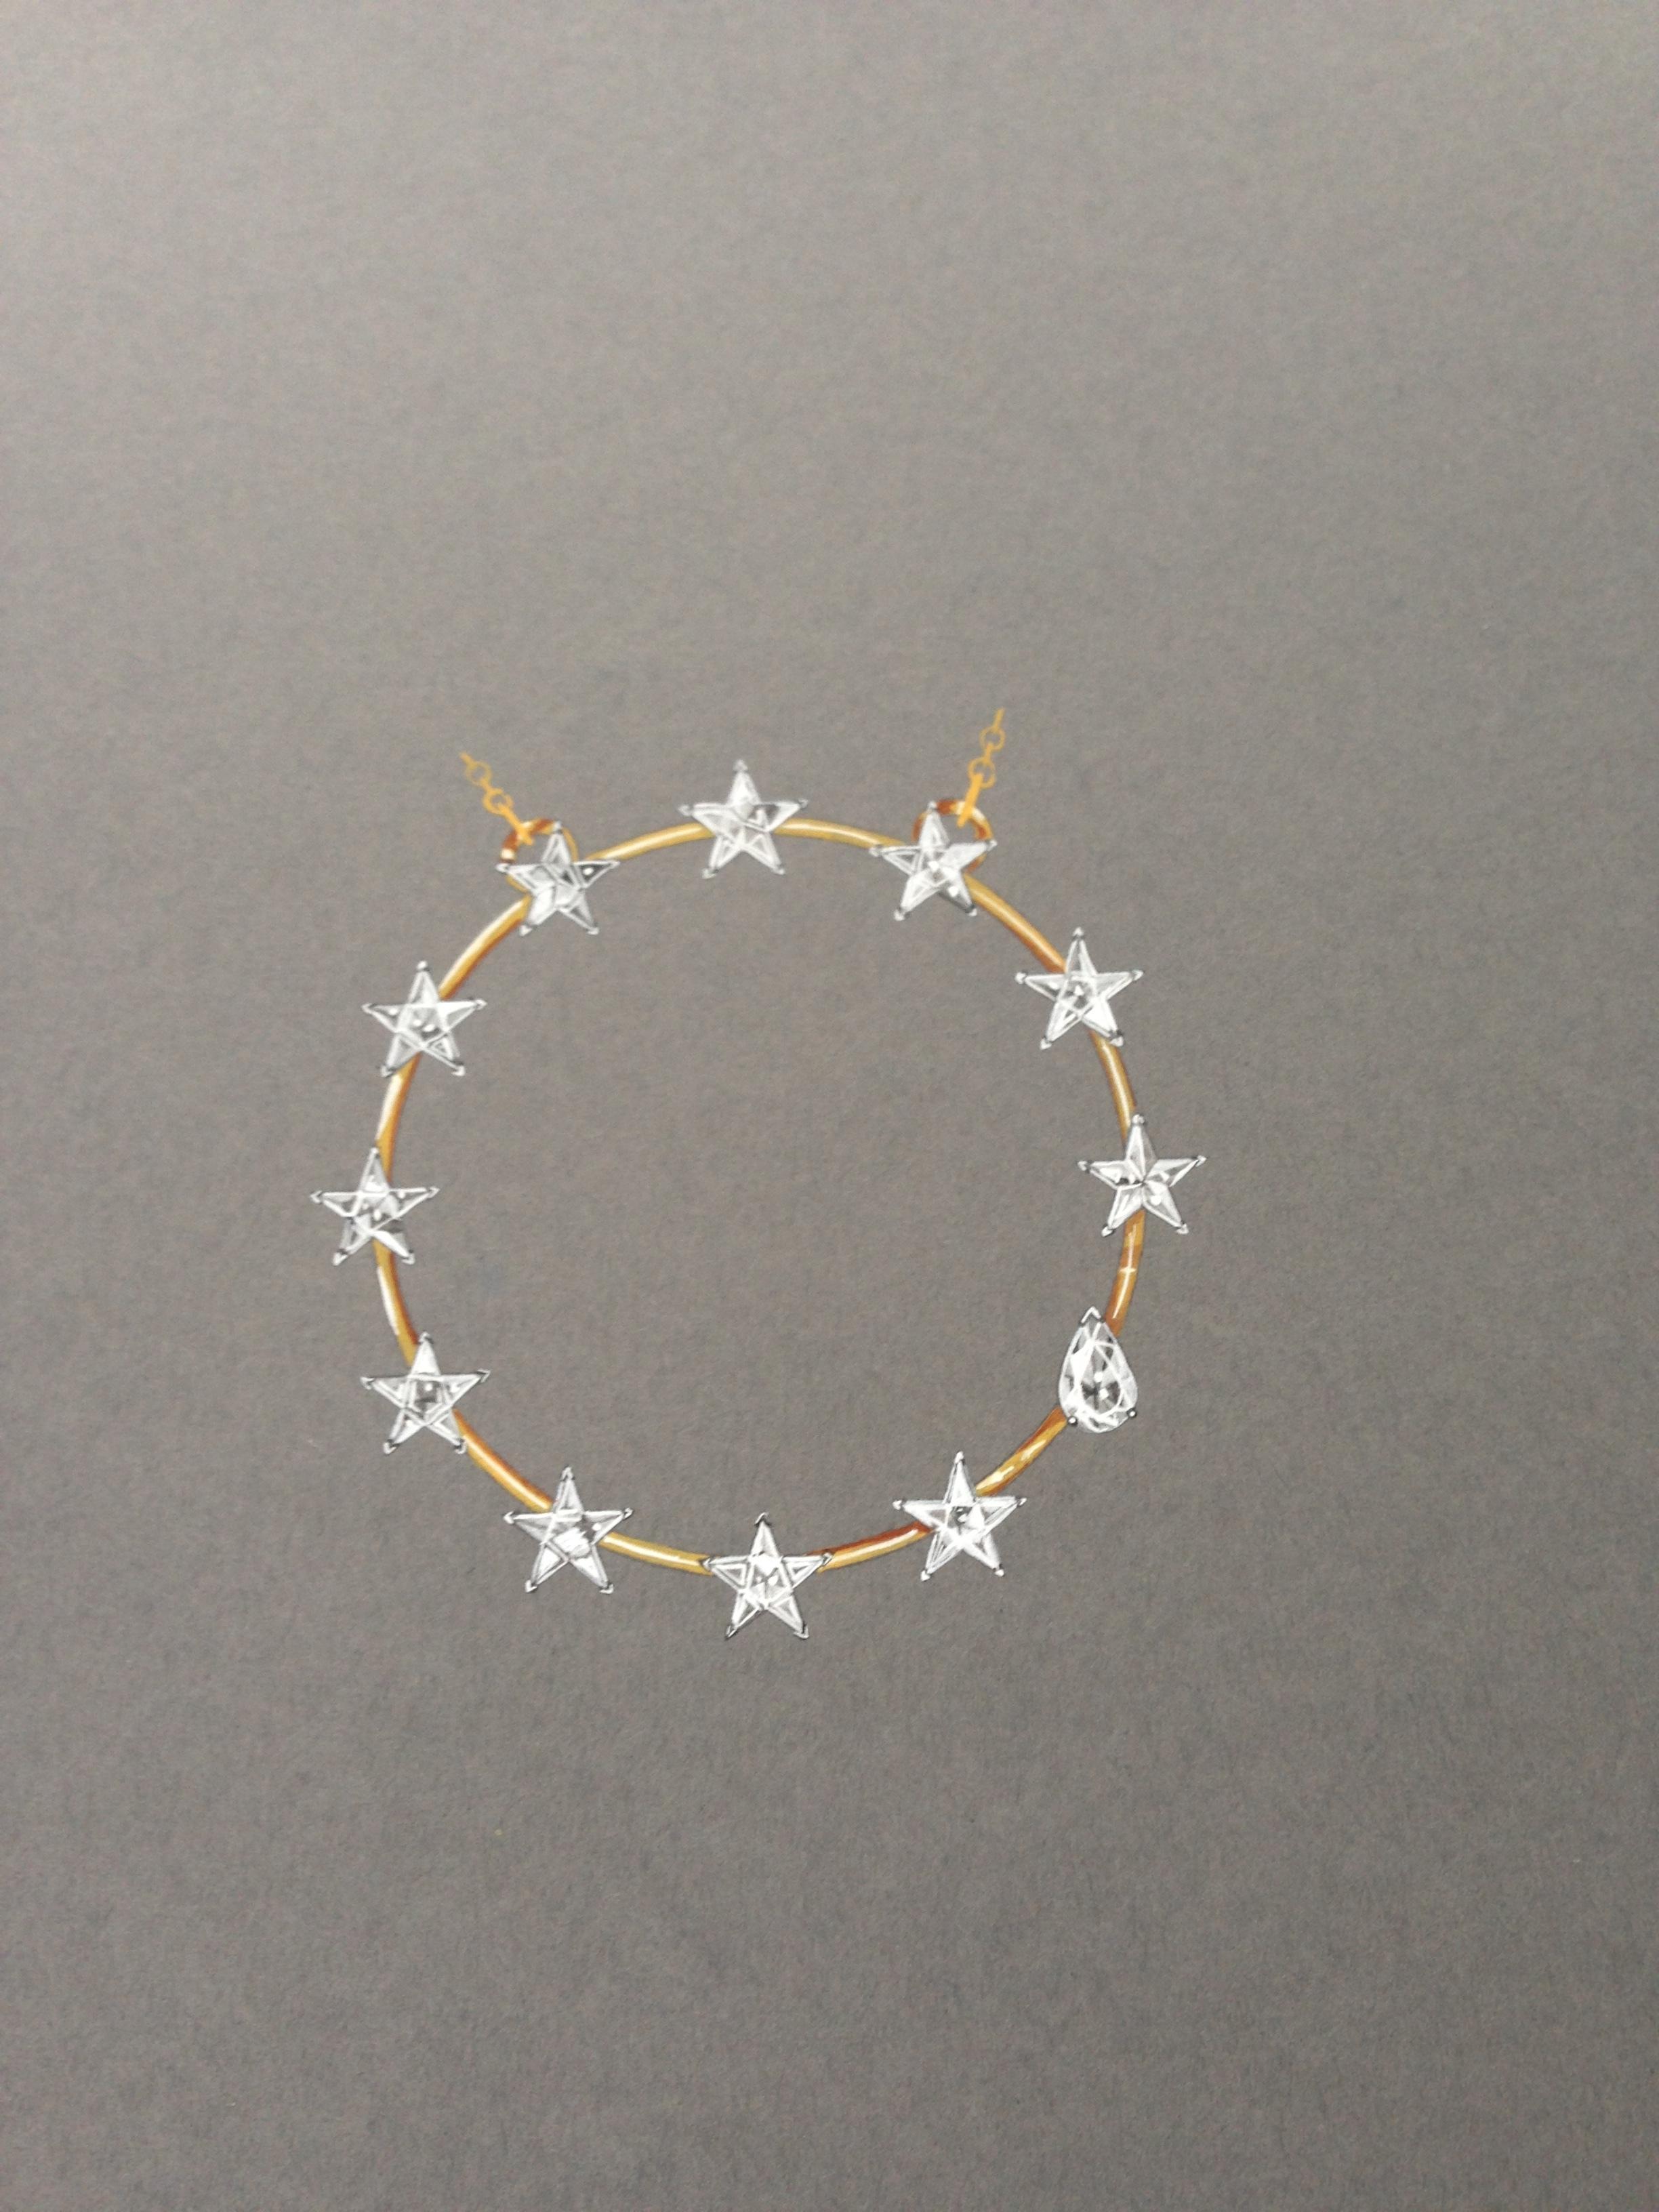 Gold star necklace render